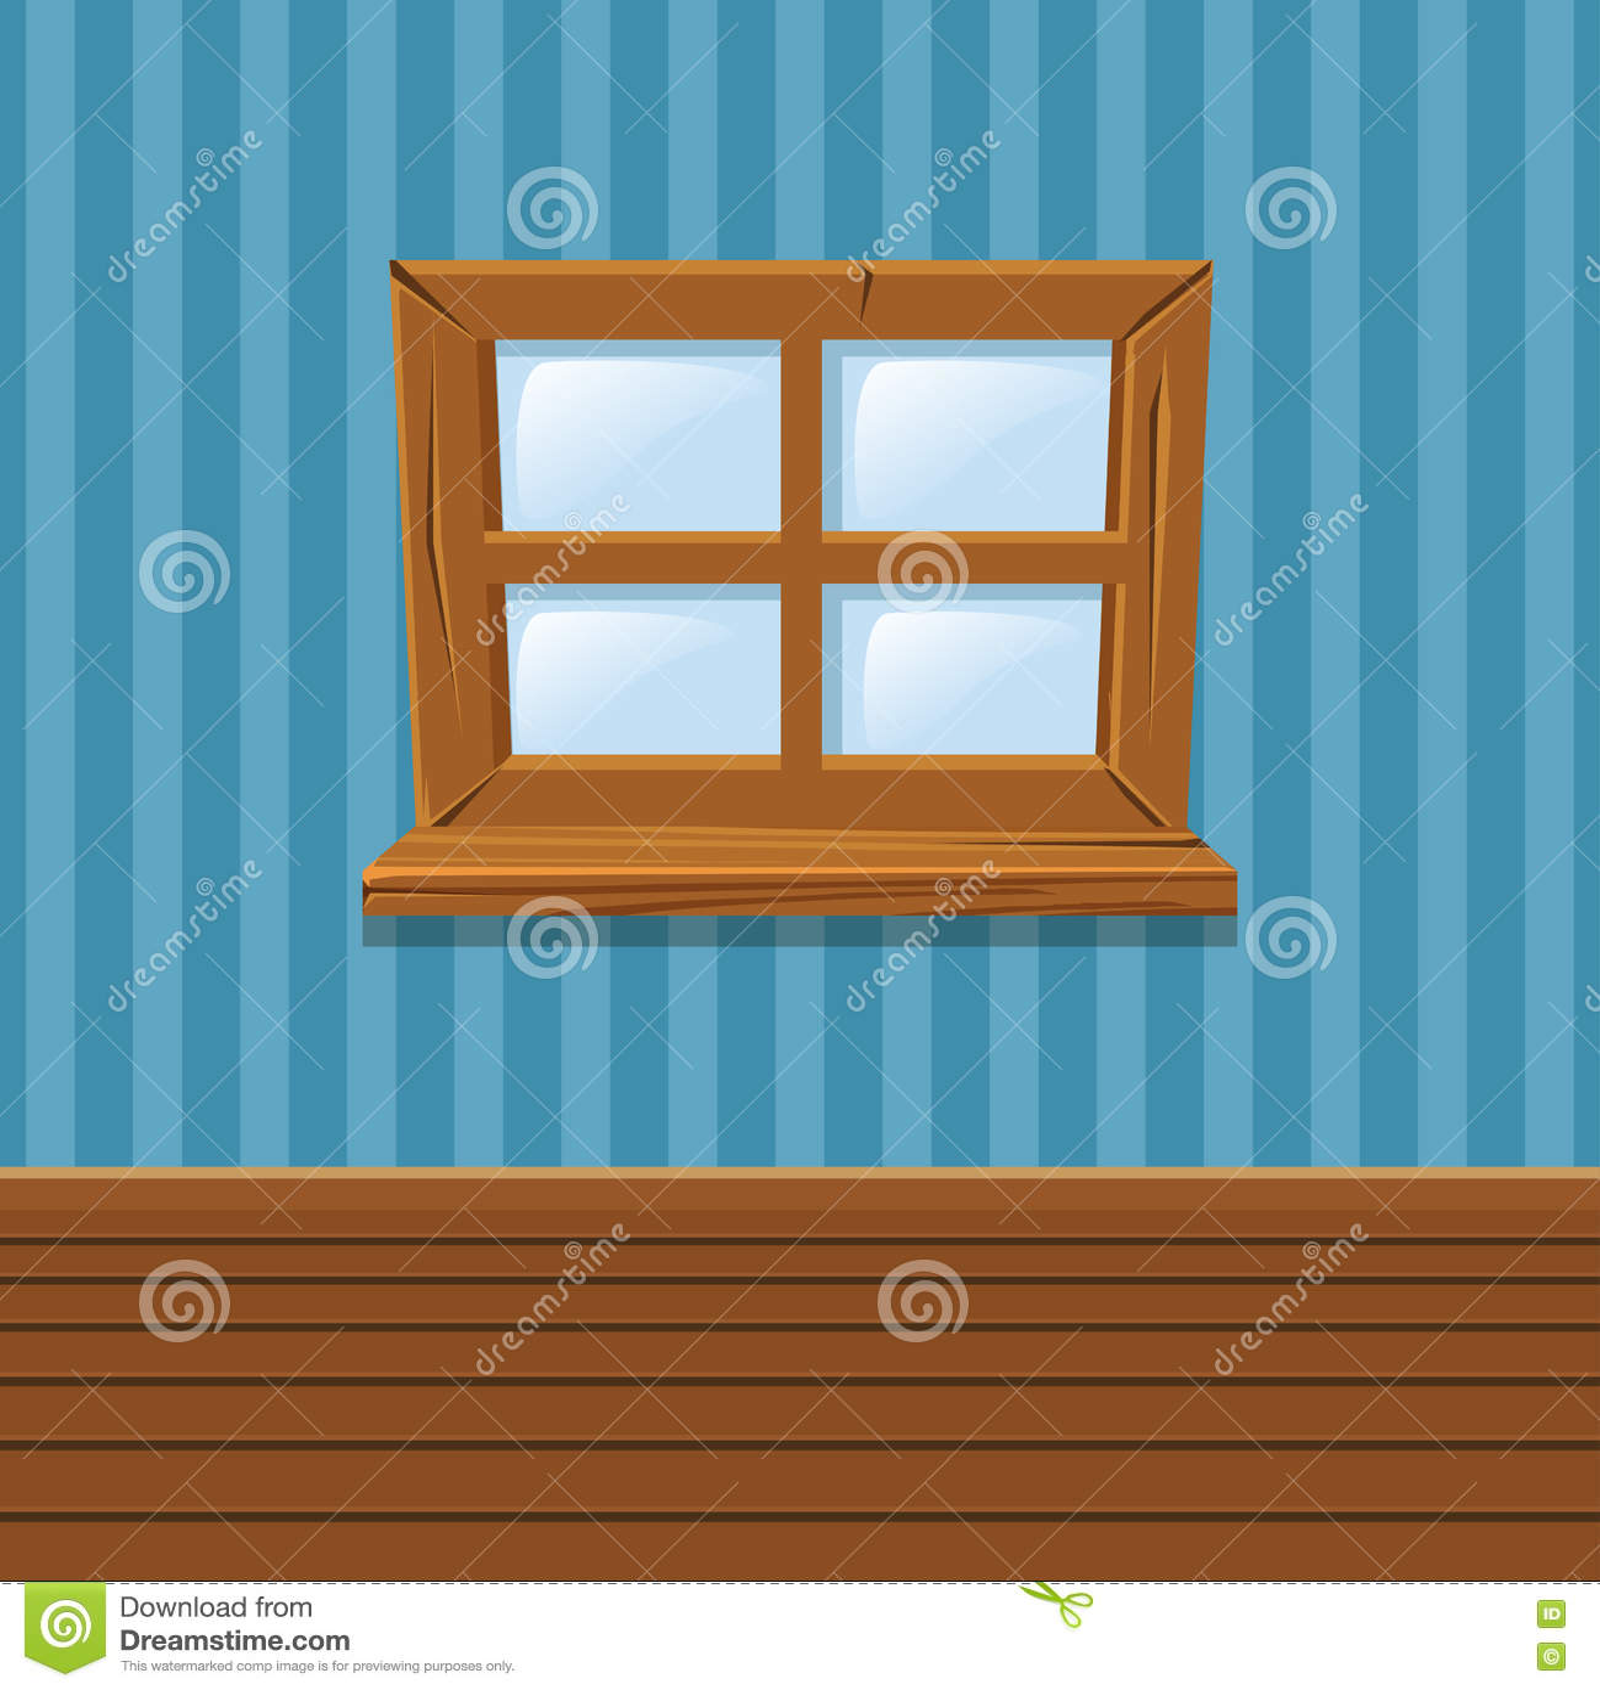 Interior wooden shelves free vector - Cartoon Wooden Window Home Interior